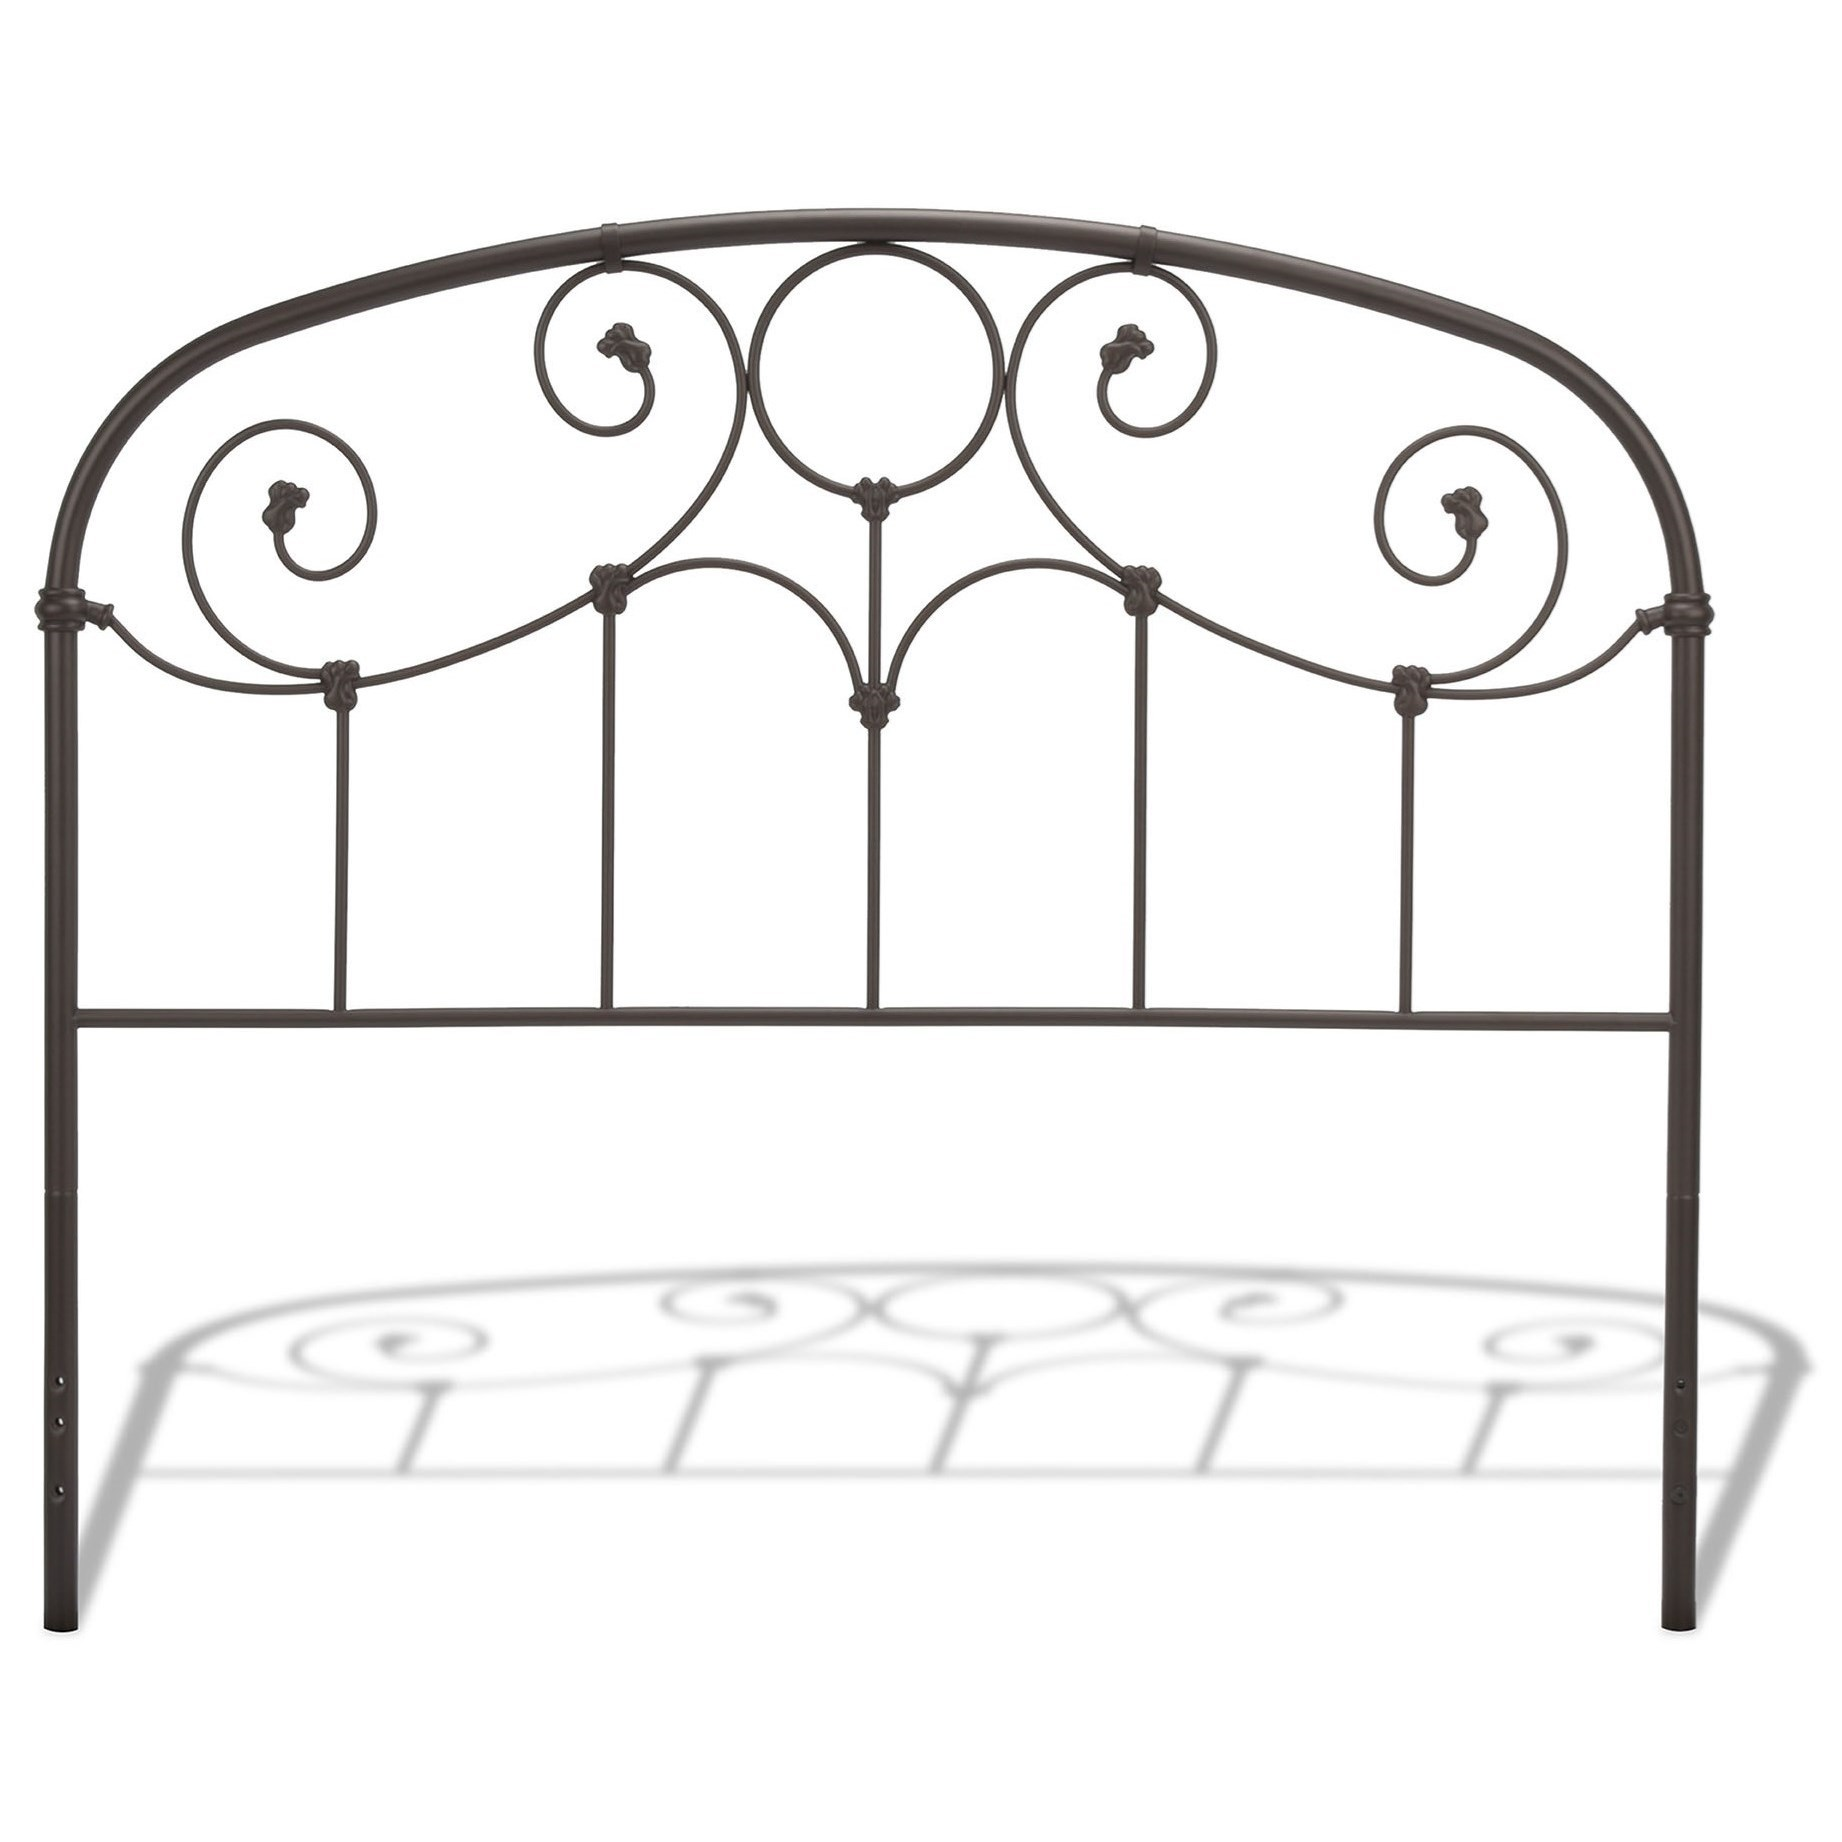 Fashion Bed Group Metal Beds B41334 Full Grafton Metal Bed